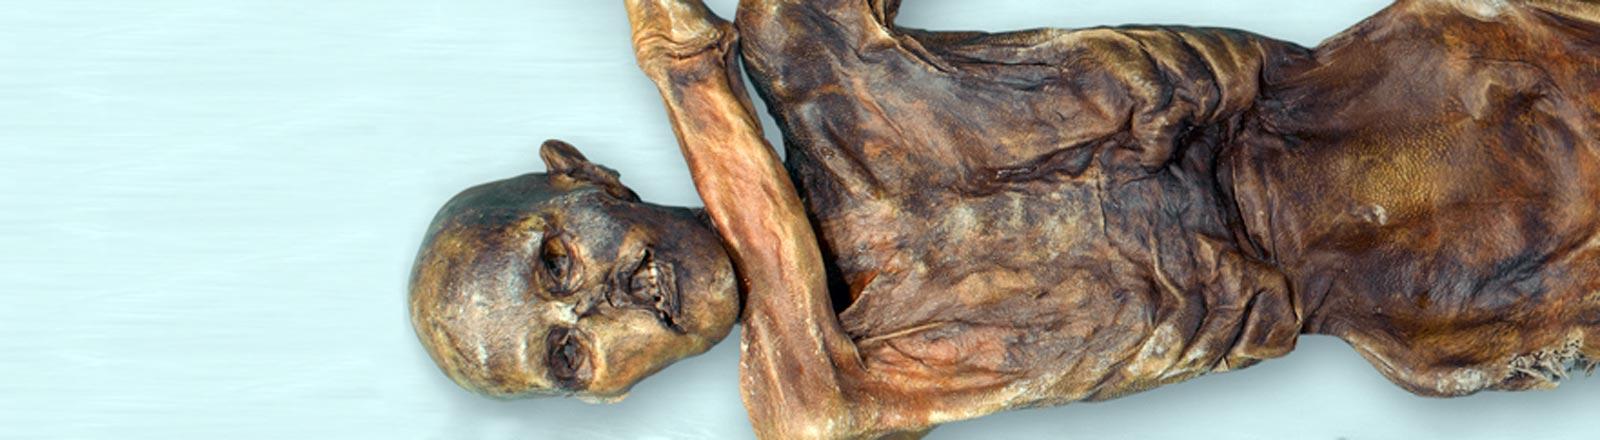 Gletschermumie Ötzi